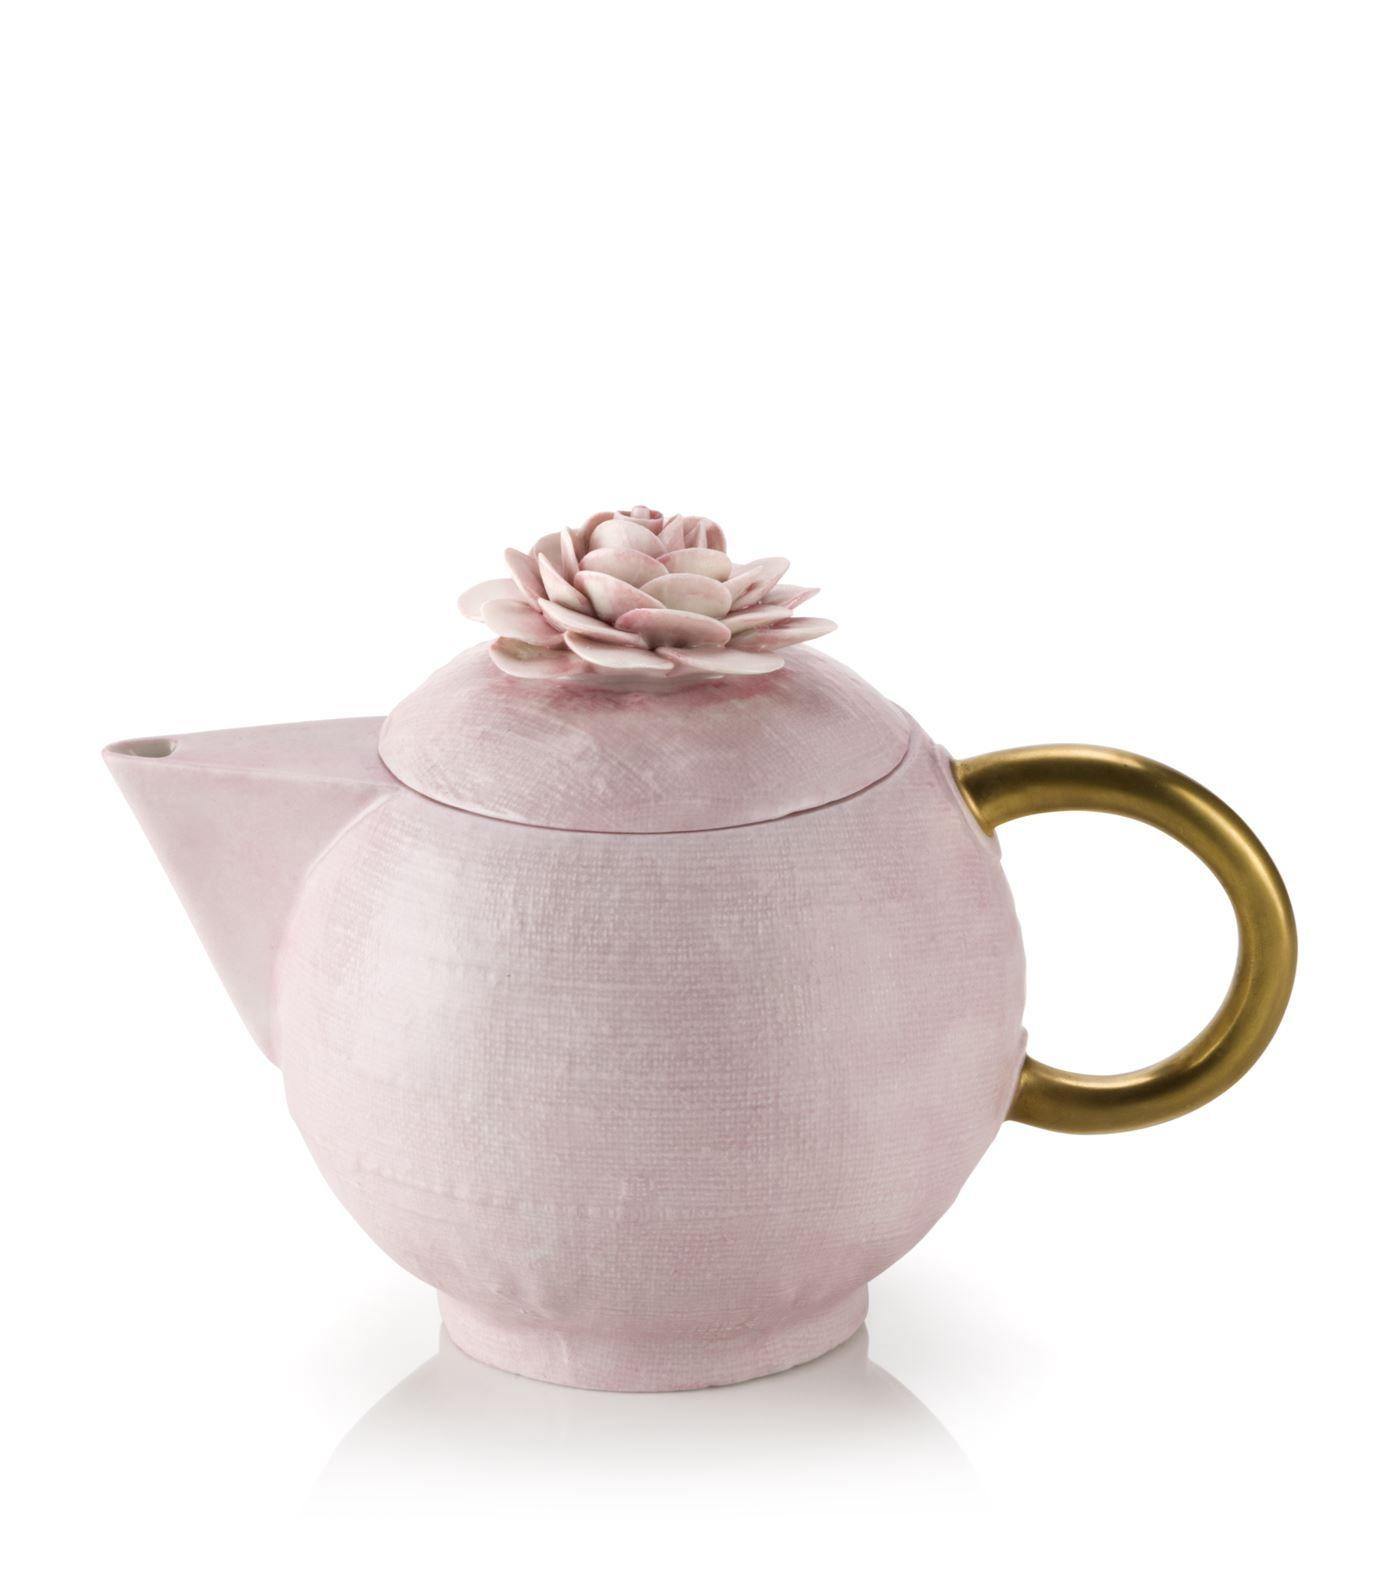 Villari Flower Teapot | Harrods.com #teapots